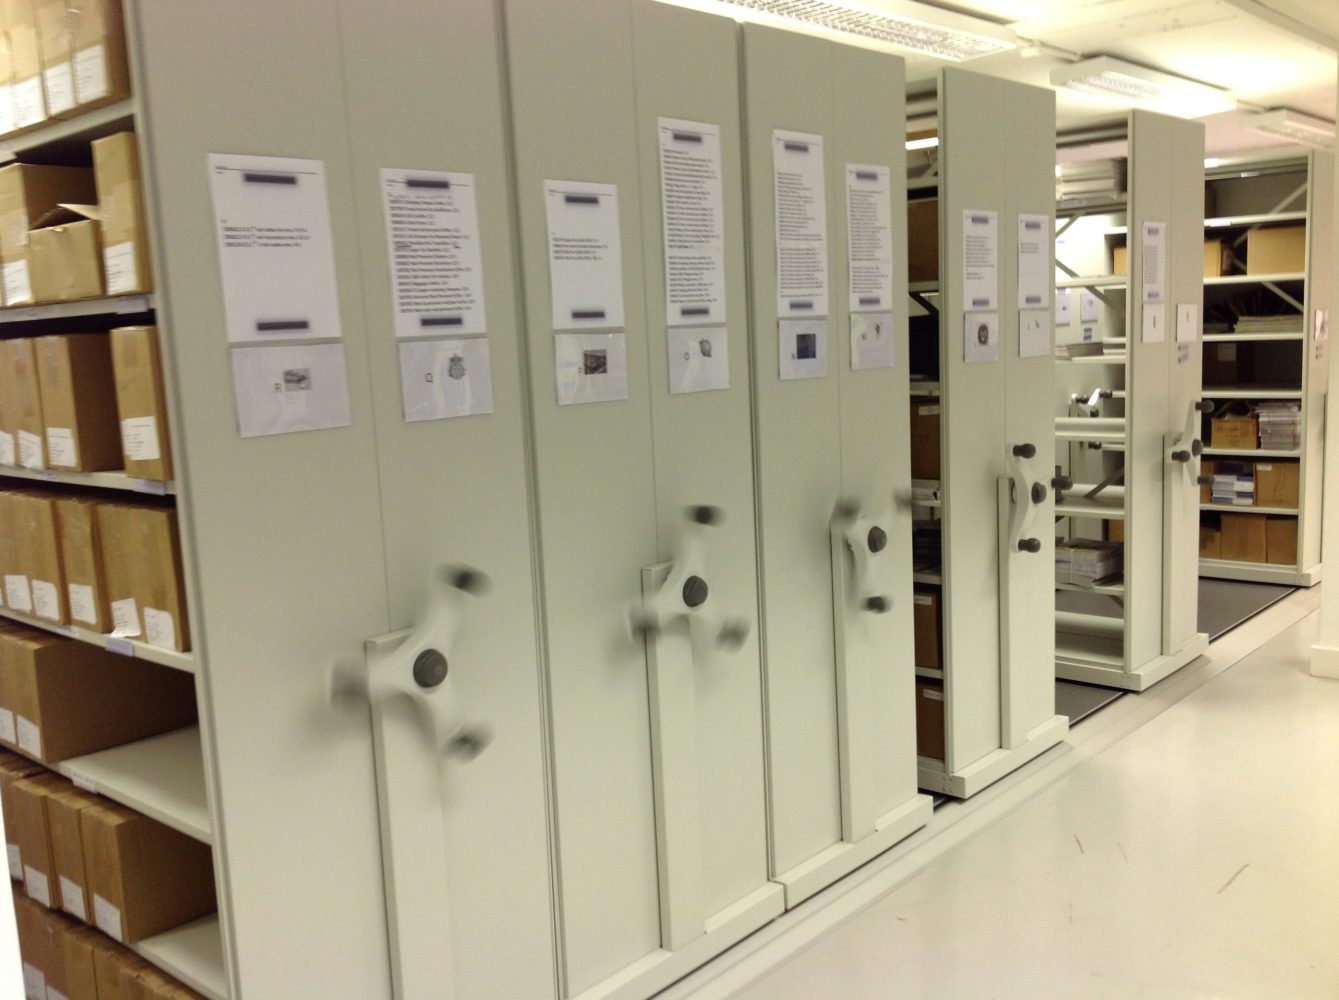 Roller racking is a high-density storage arrangement